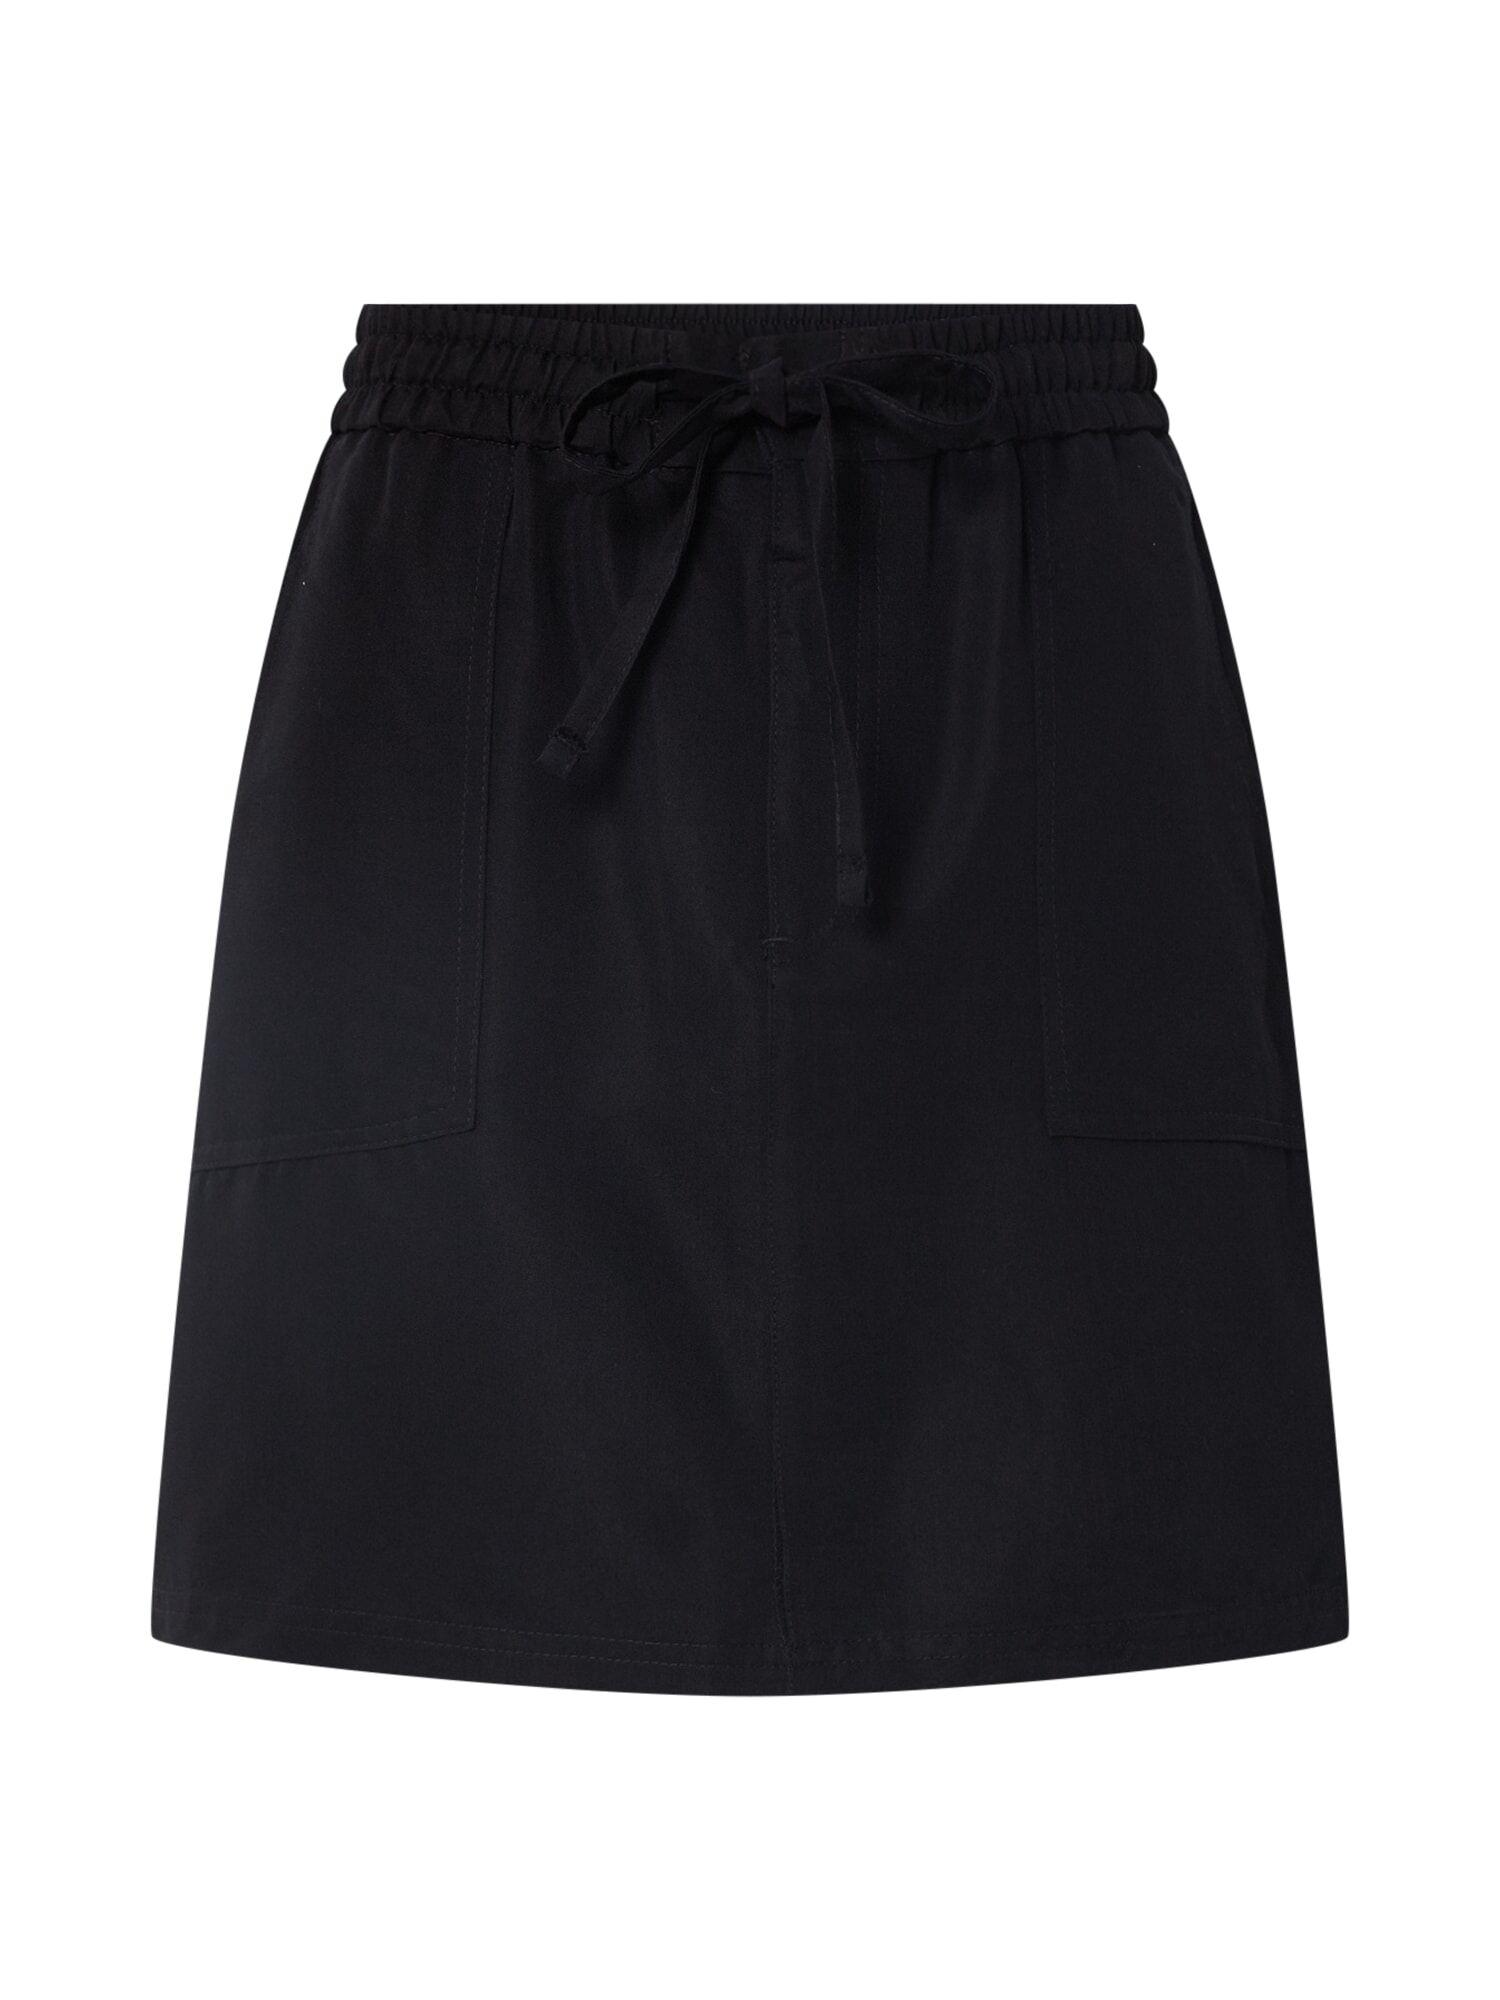 Urban Classics Jupe  - Noir - Taille: S - female